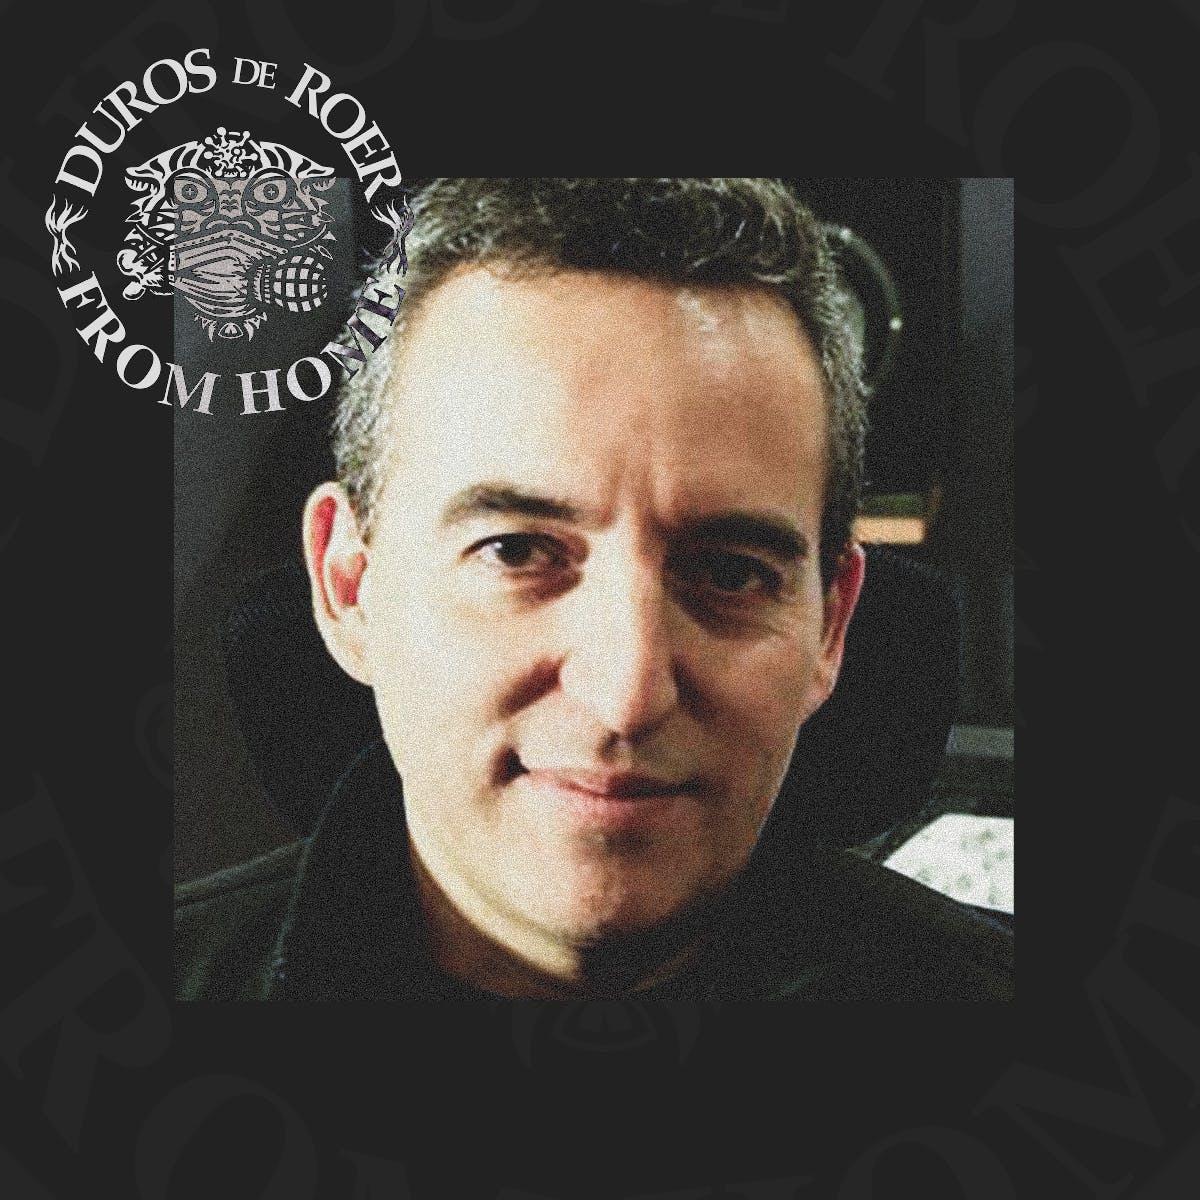 Chalo González - Duros de Roer - Emisor Podcasting